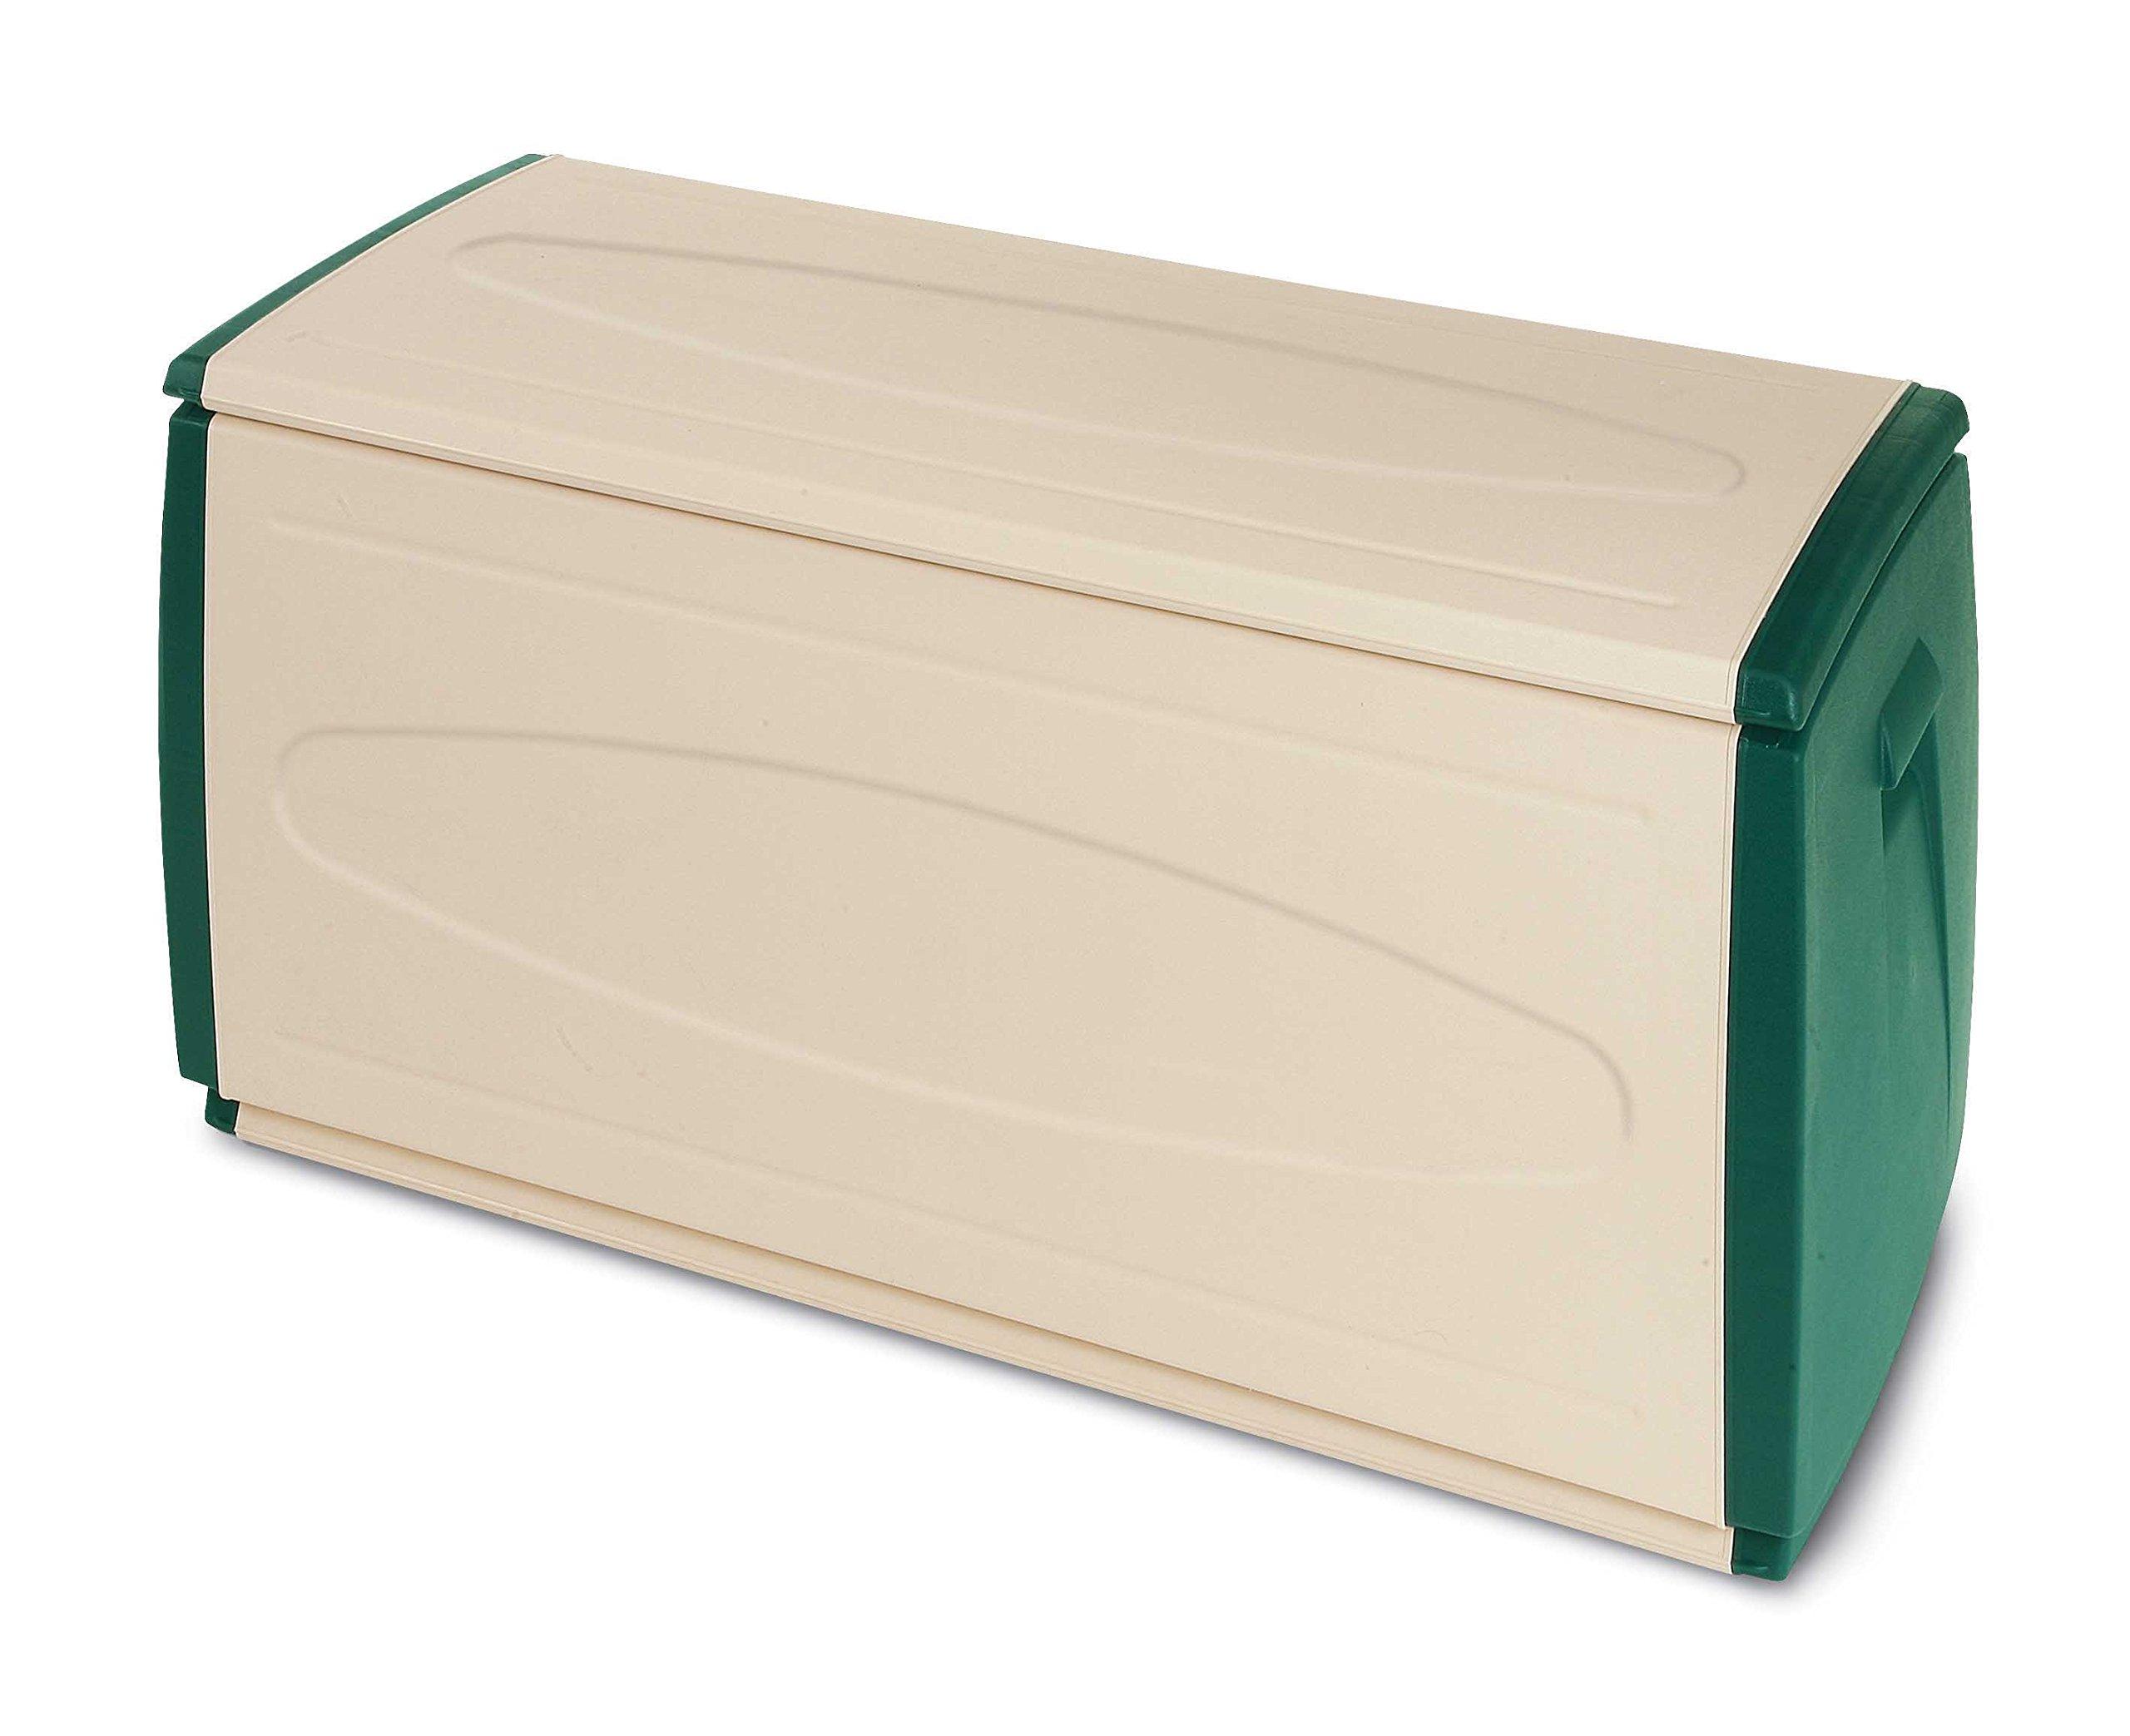 Terry Prince Box 120g Plastic Trunk/Storage Box, 120x 54x 57cm (Beige/Green)